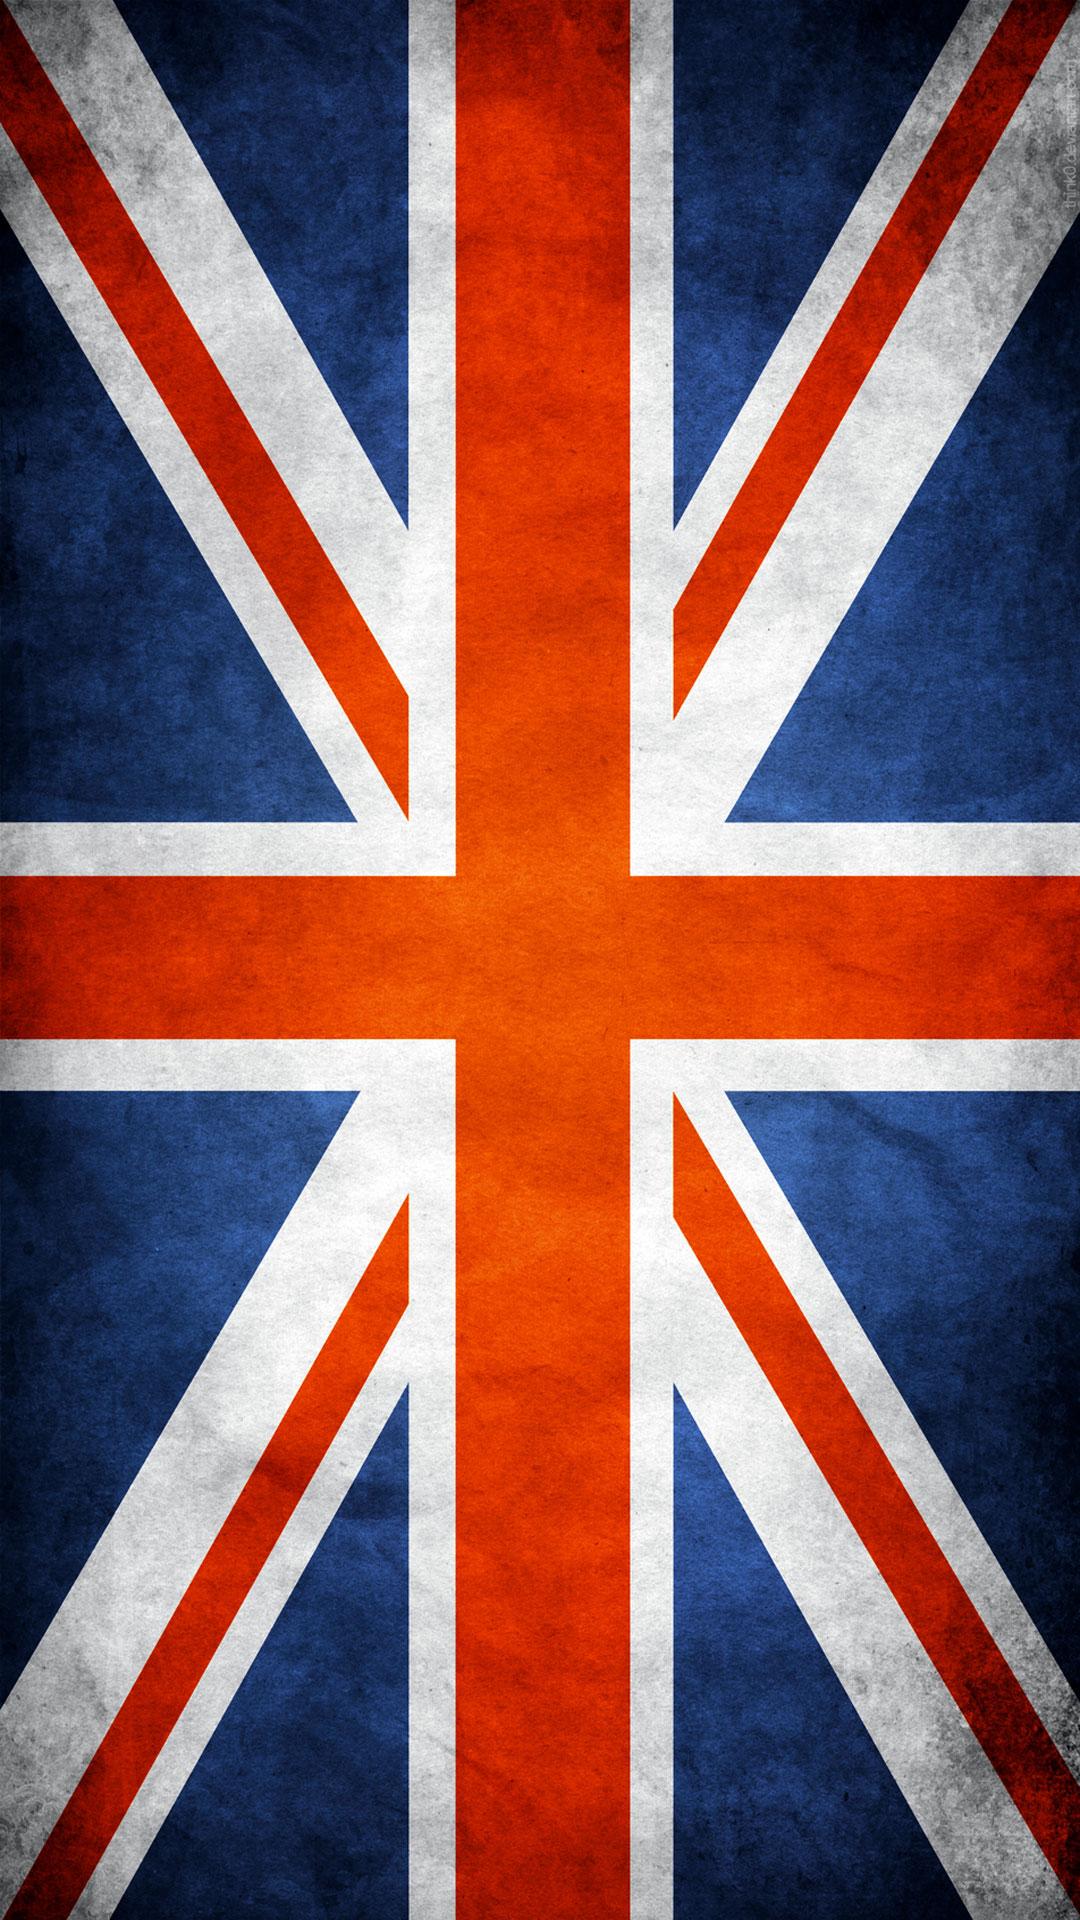 UK Flag iPhone 6 Plus wallpaper 25 Best Cool iPhone 6 Plus Wallpapers 1080x1920